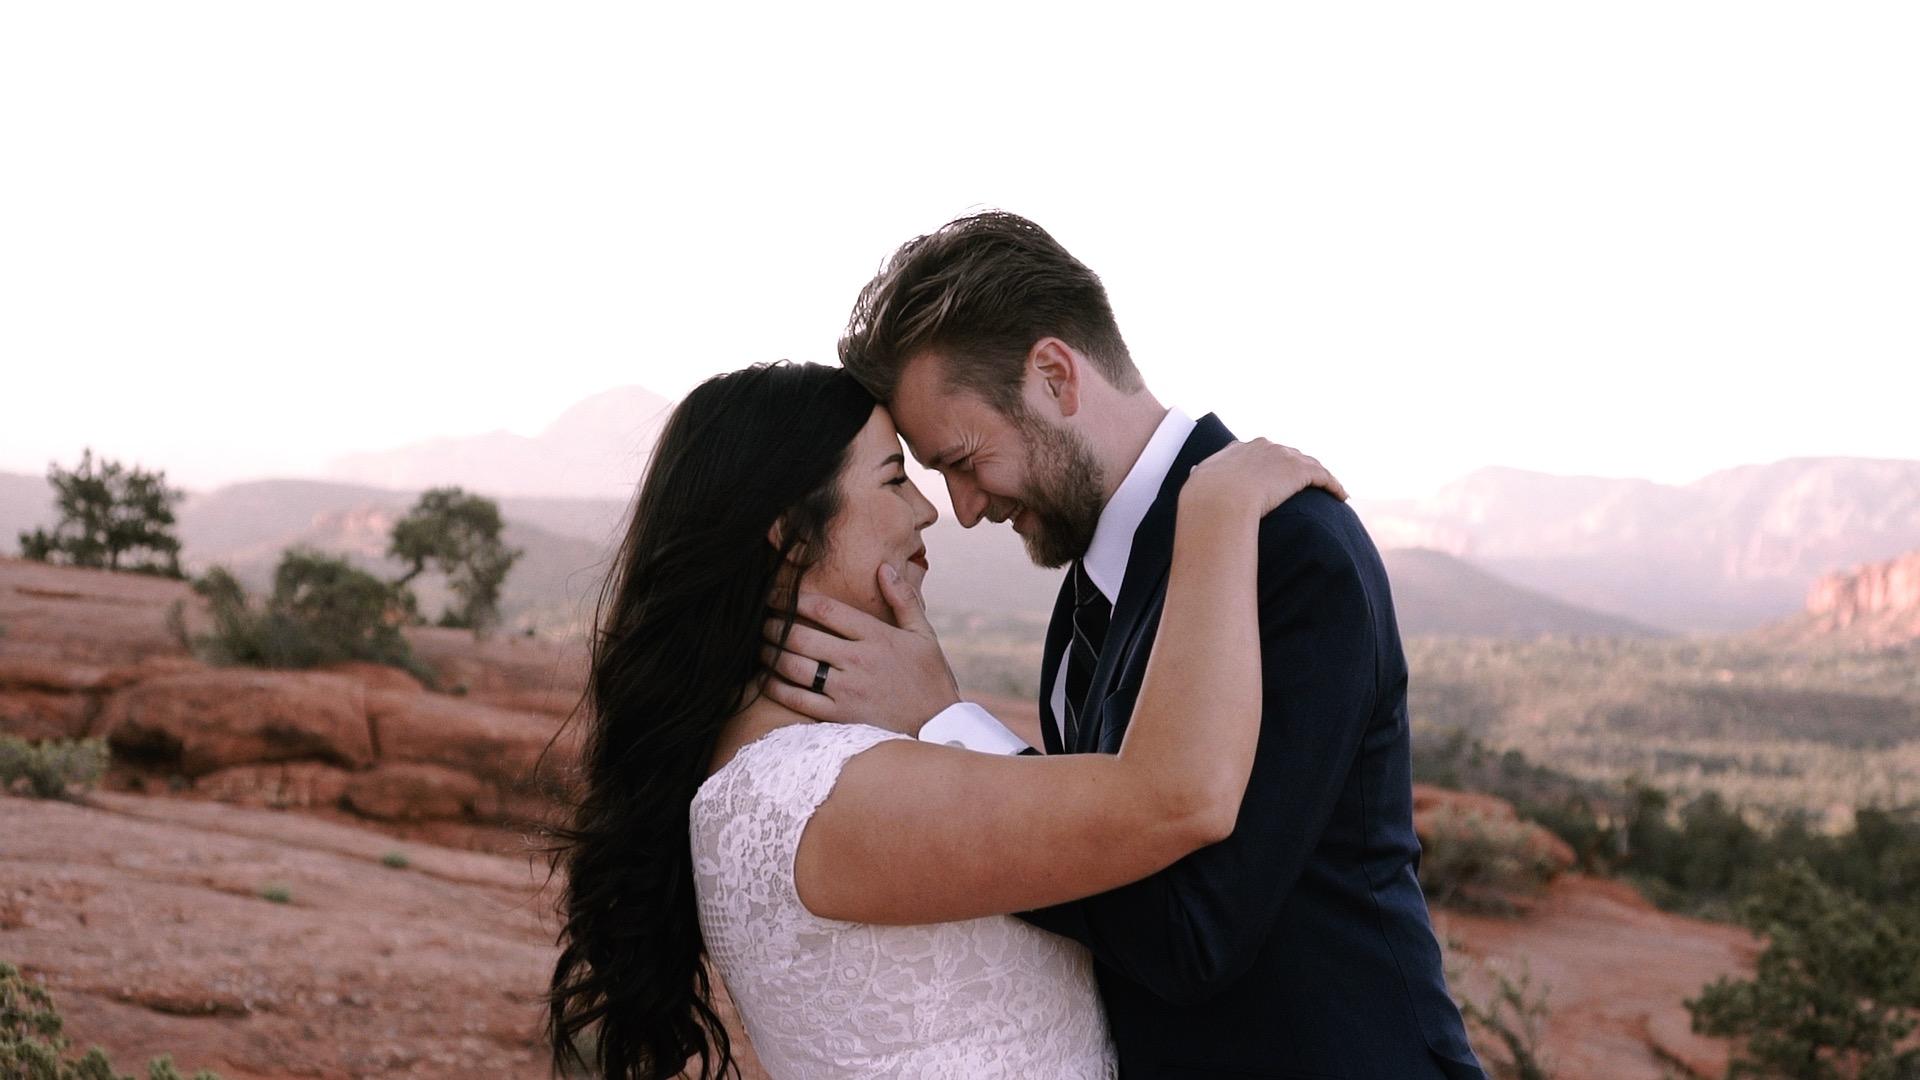 Jim + Gabriella | Sedona, Arizona | Yavapai Trail